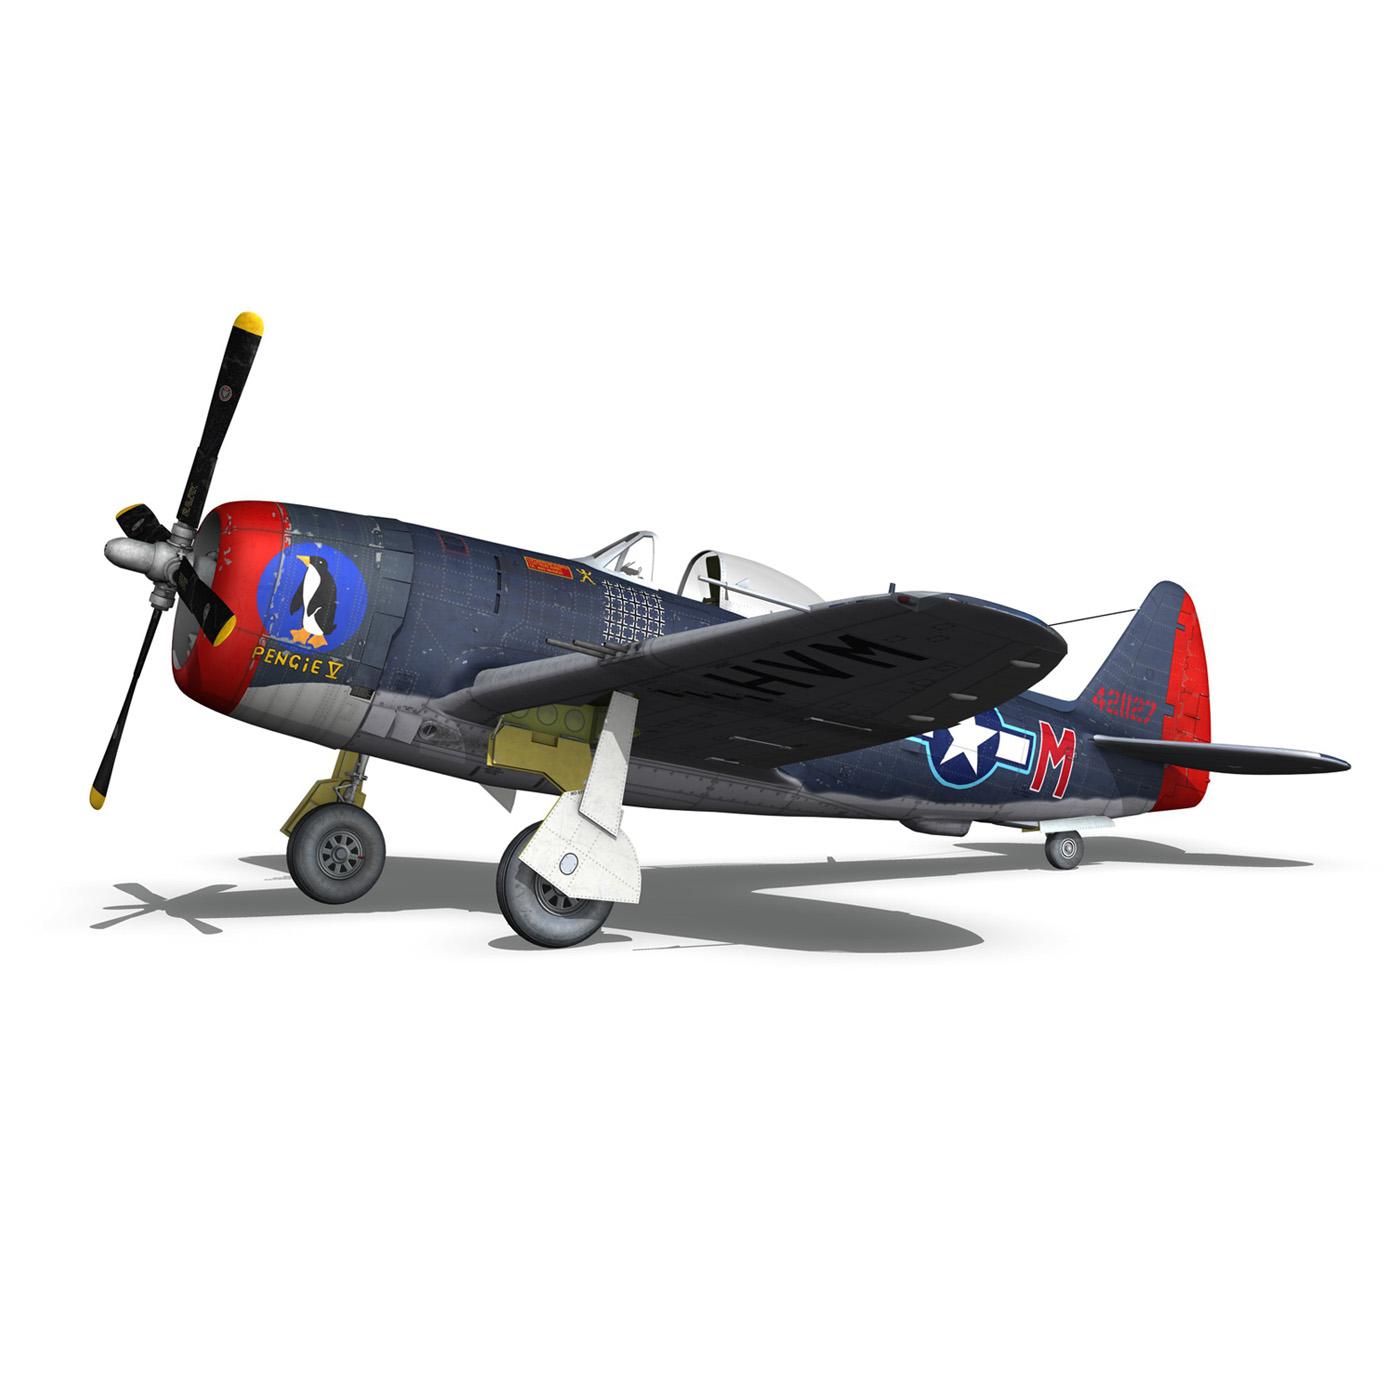 republic p-47m thunderbolt – pengie v 3d model 3ds c4d fbx lwo lw lws obj 279724